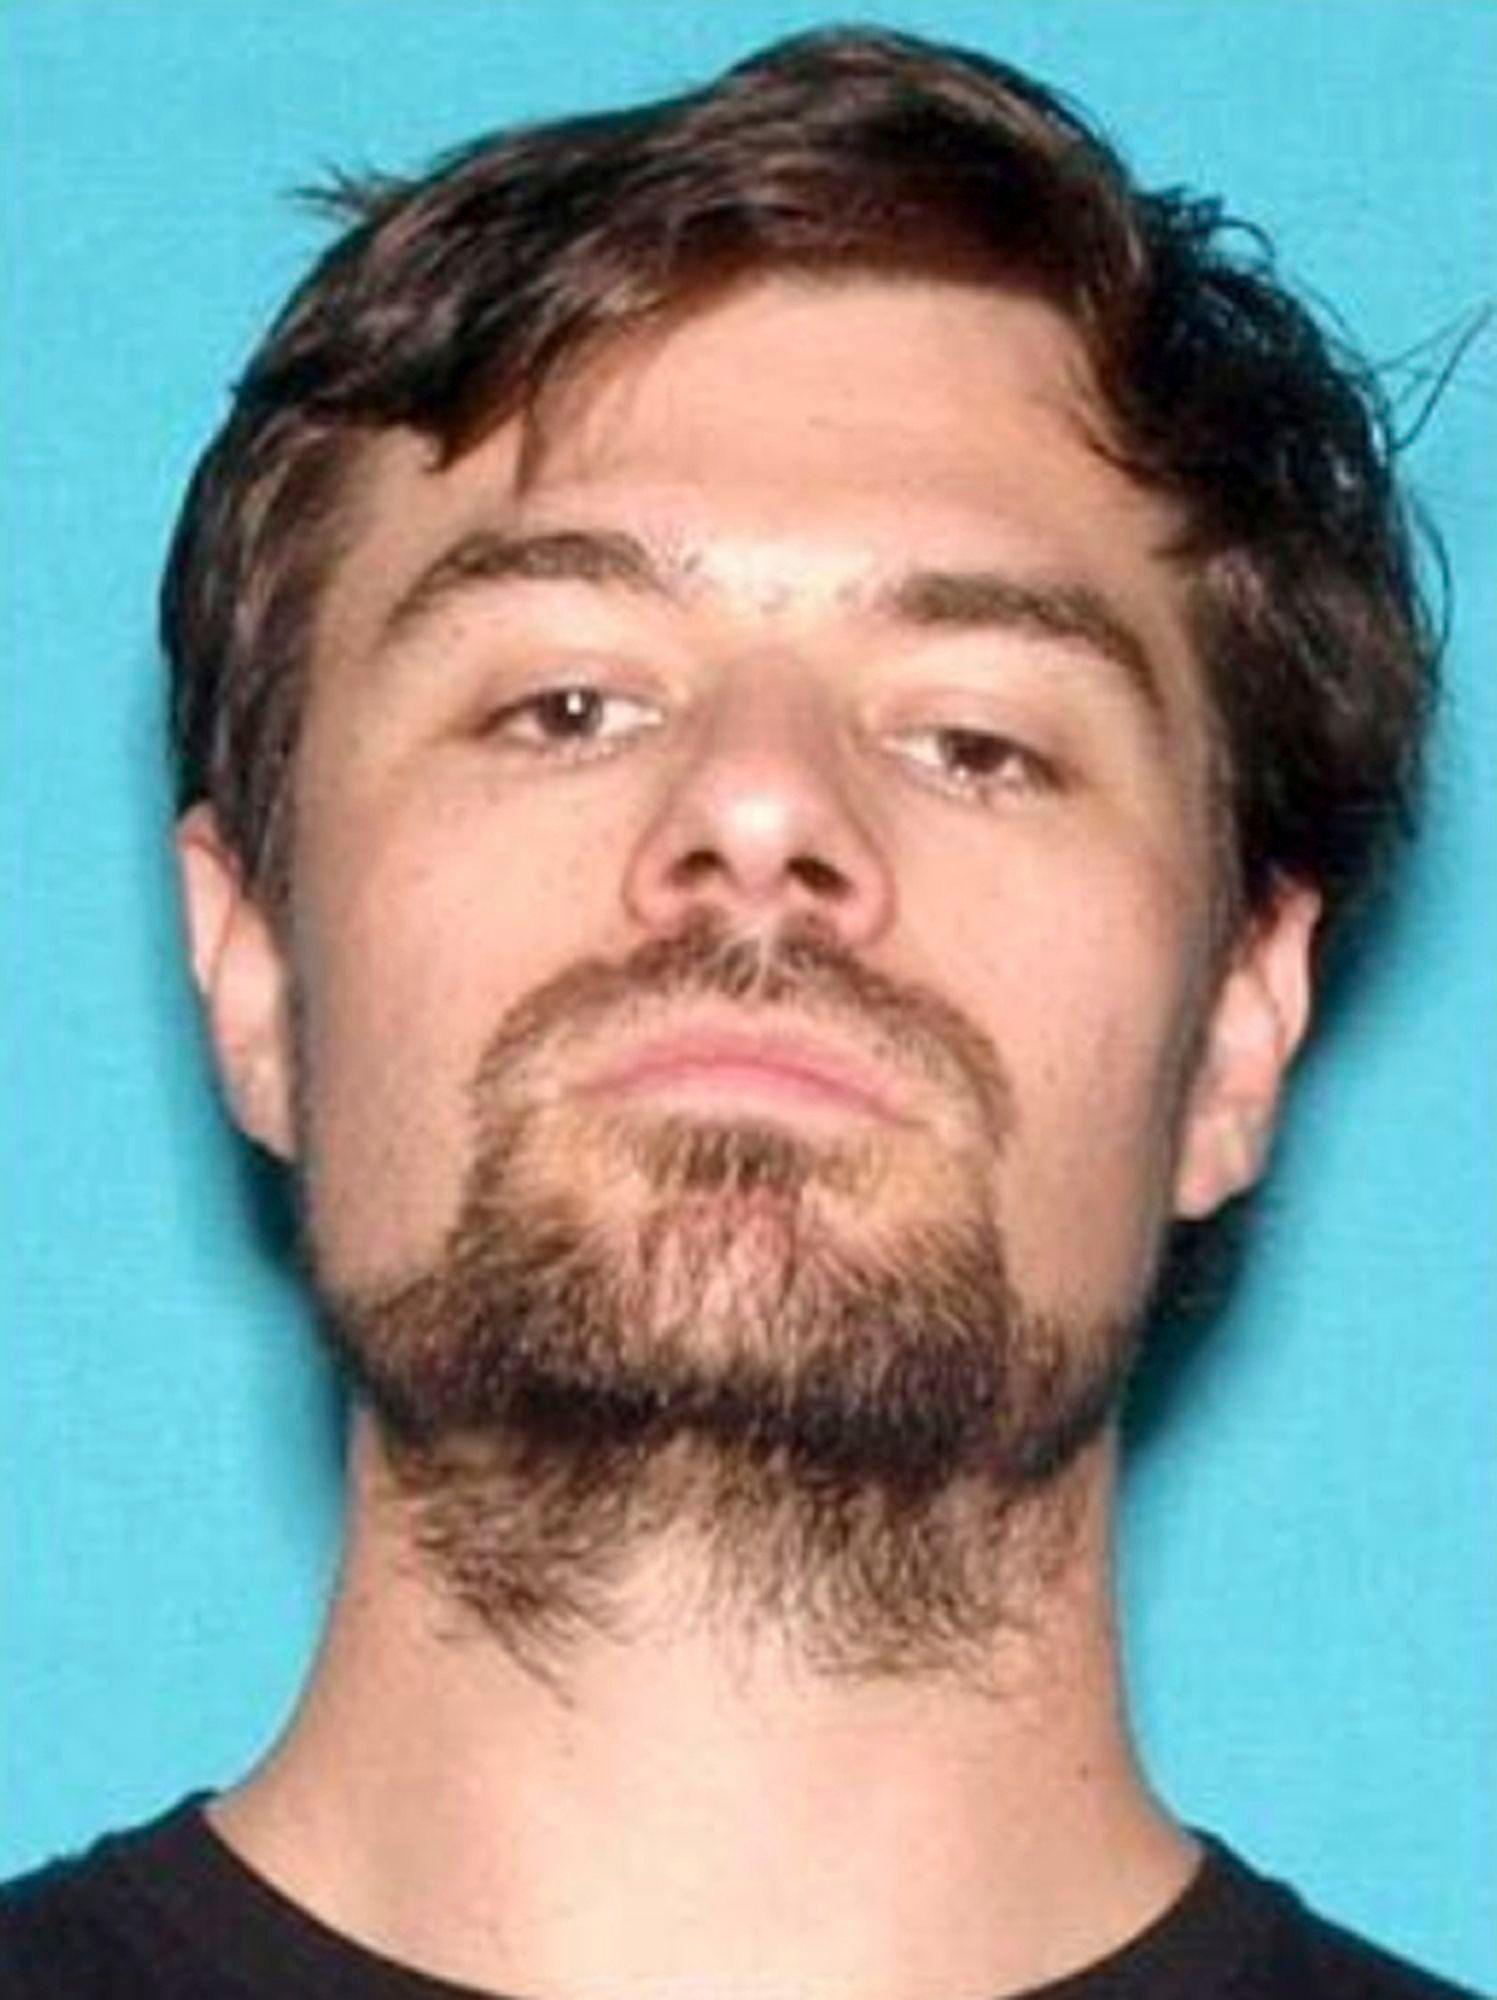 Details emerge about Thousand Oaks gunman, but motive still a mystery